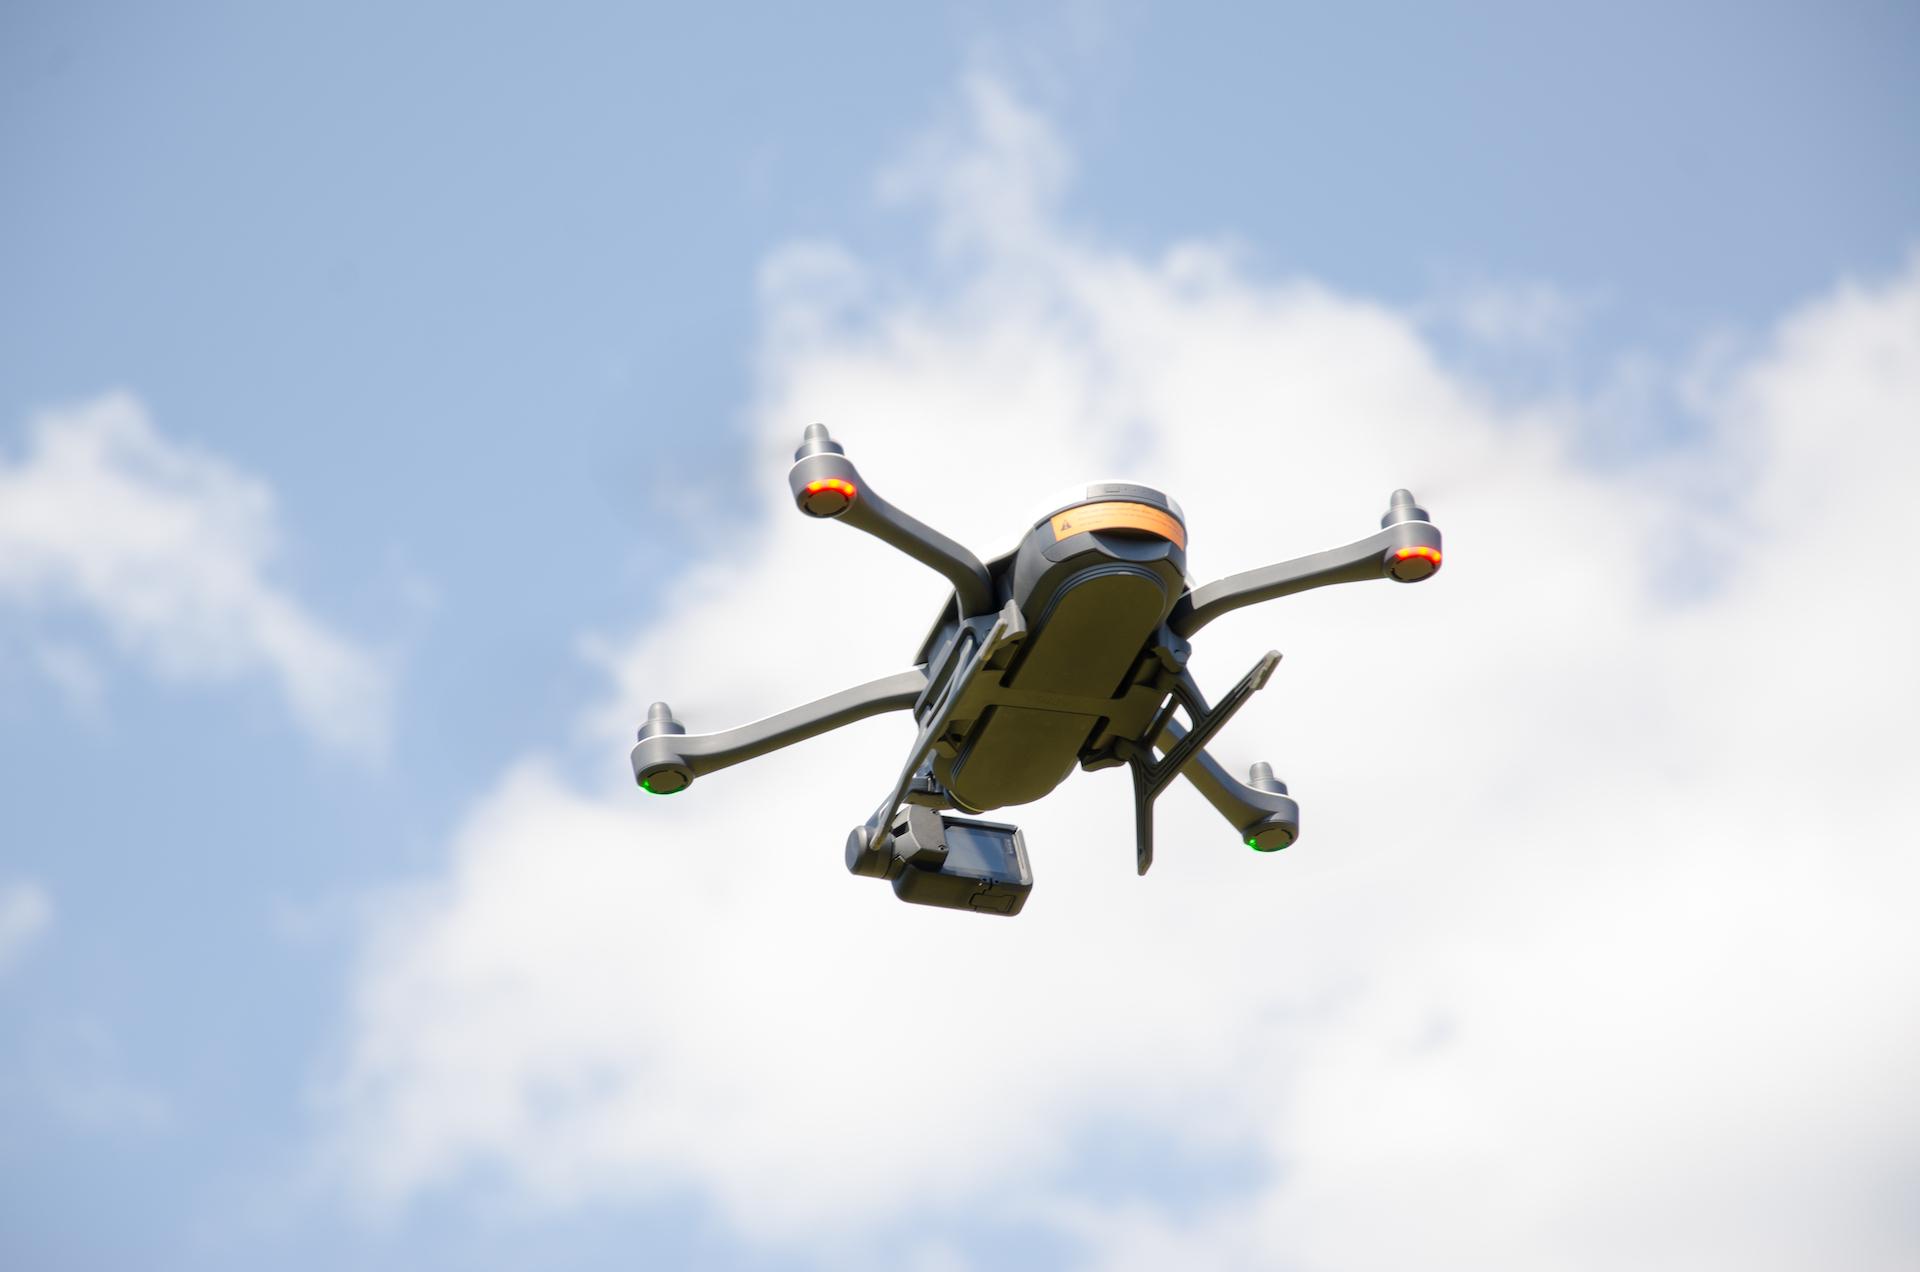 GoPro 取得無人機消噪技術專利 預示將有機會重返航空市場?